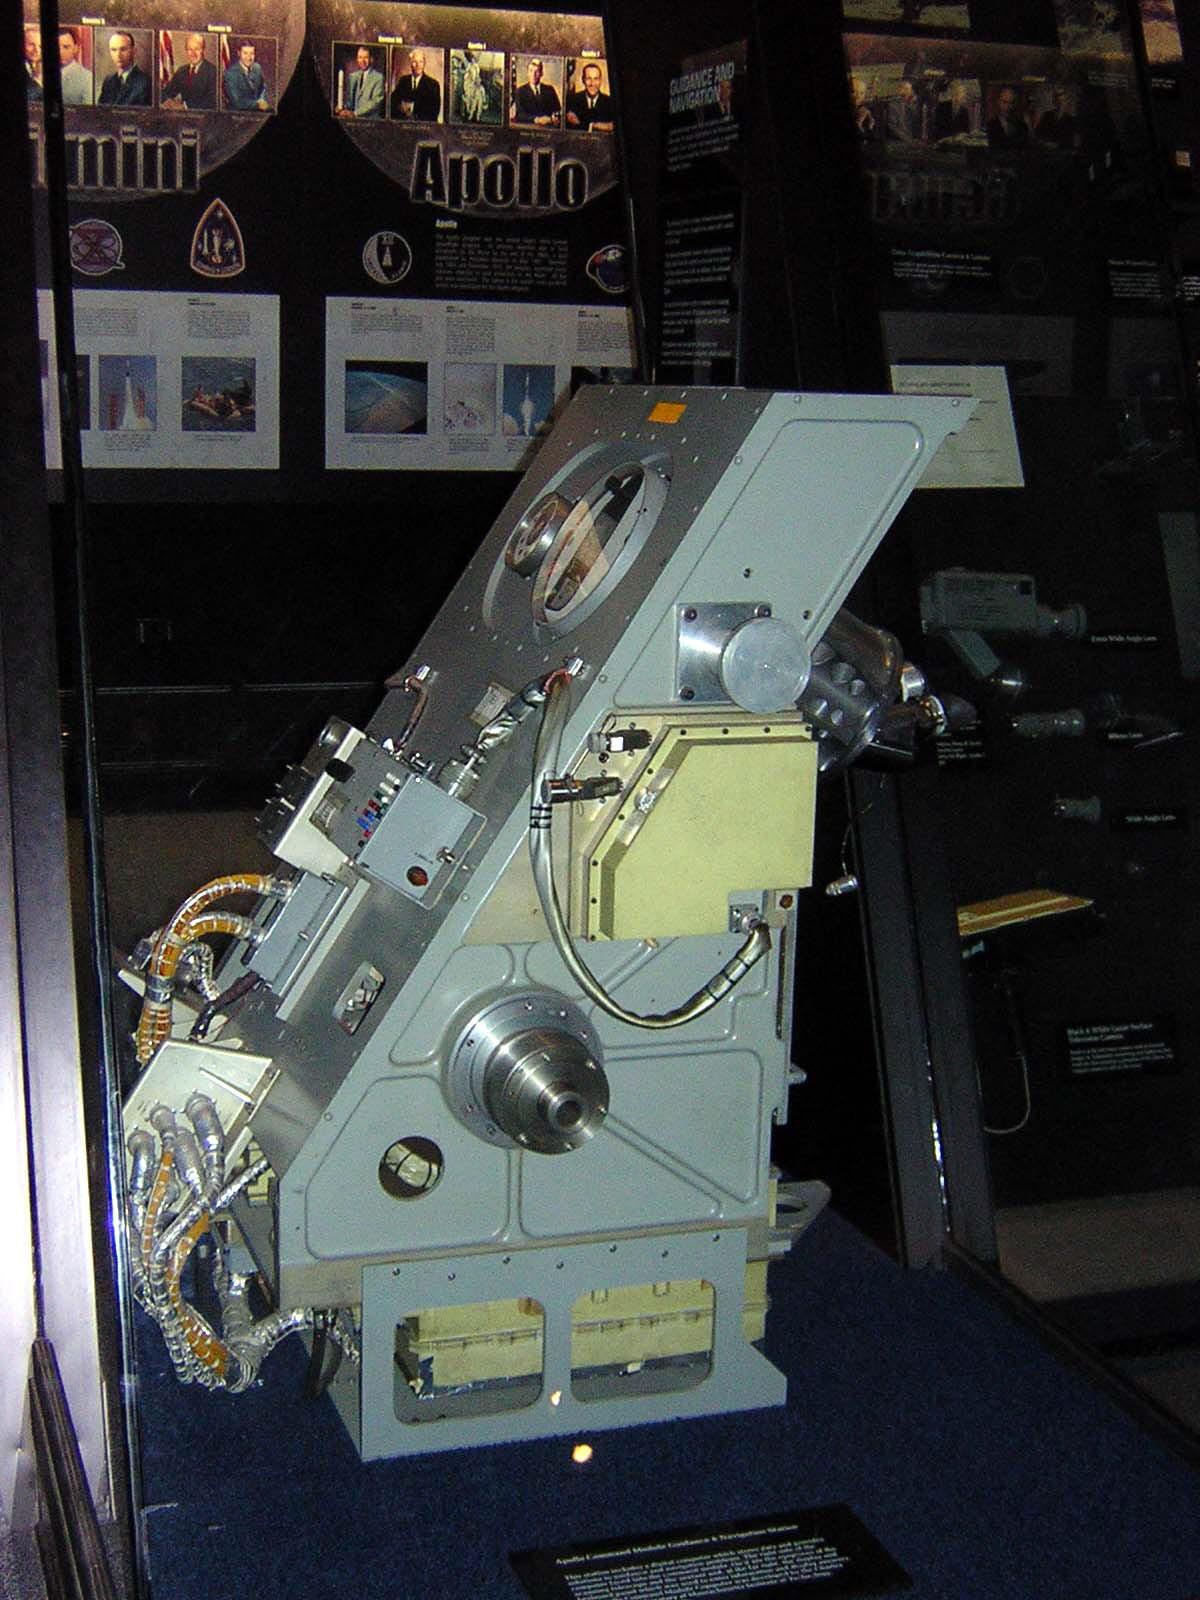 apollo spacecraft navigation - photo #6